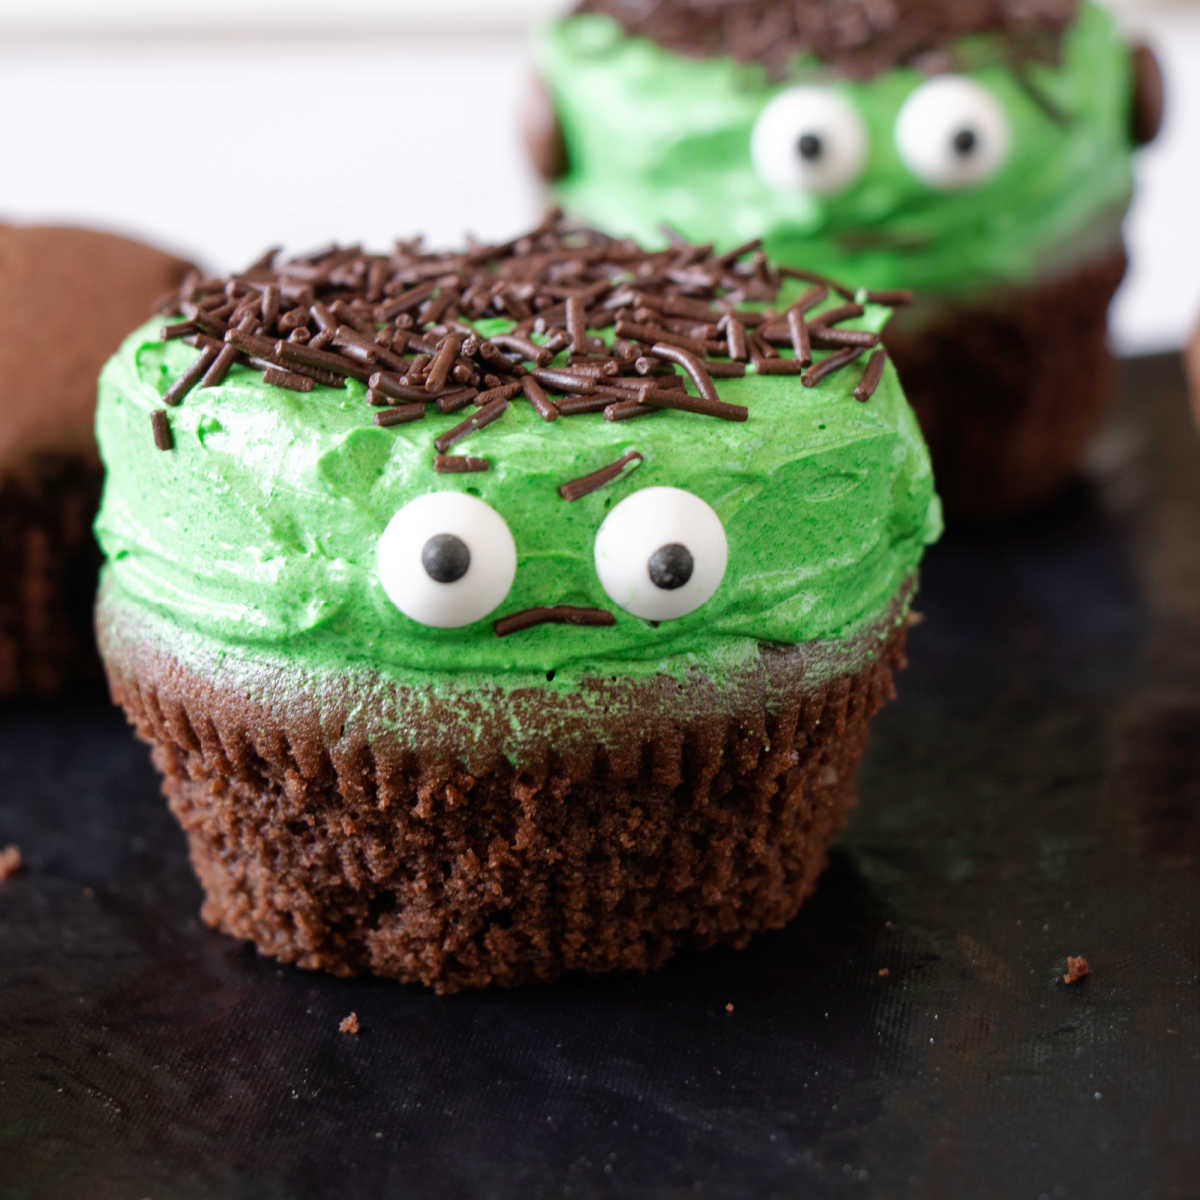 Chocolate cupcake decorated like Frankenstein for Halloween.